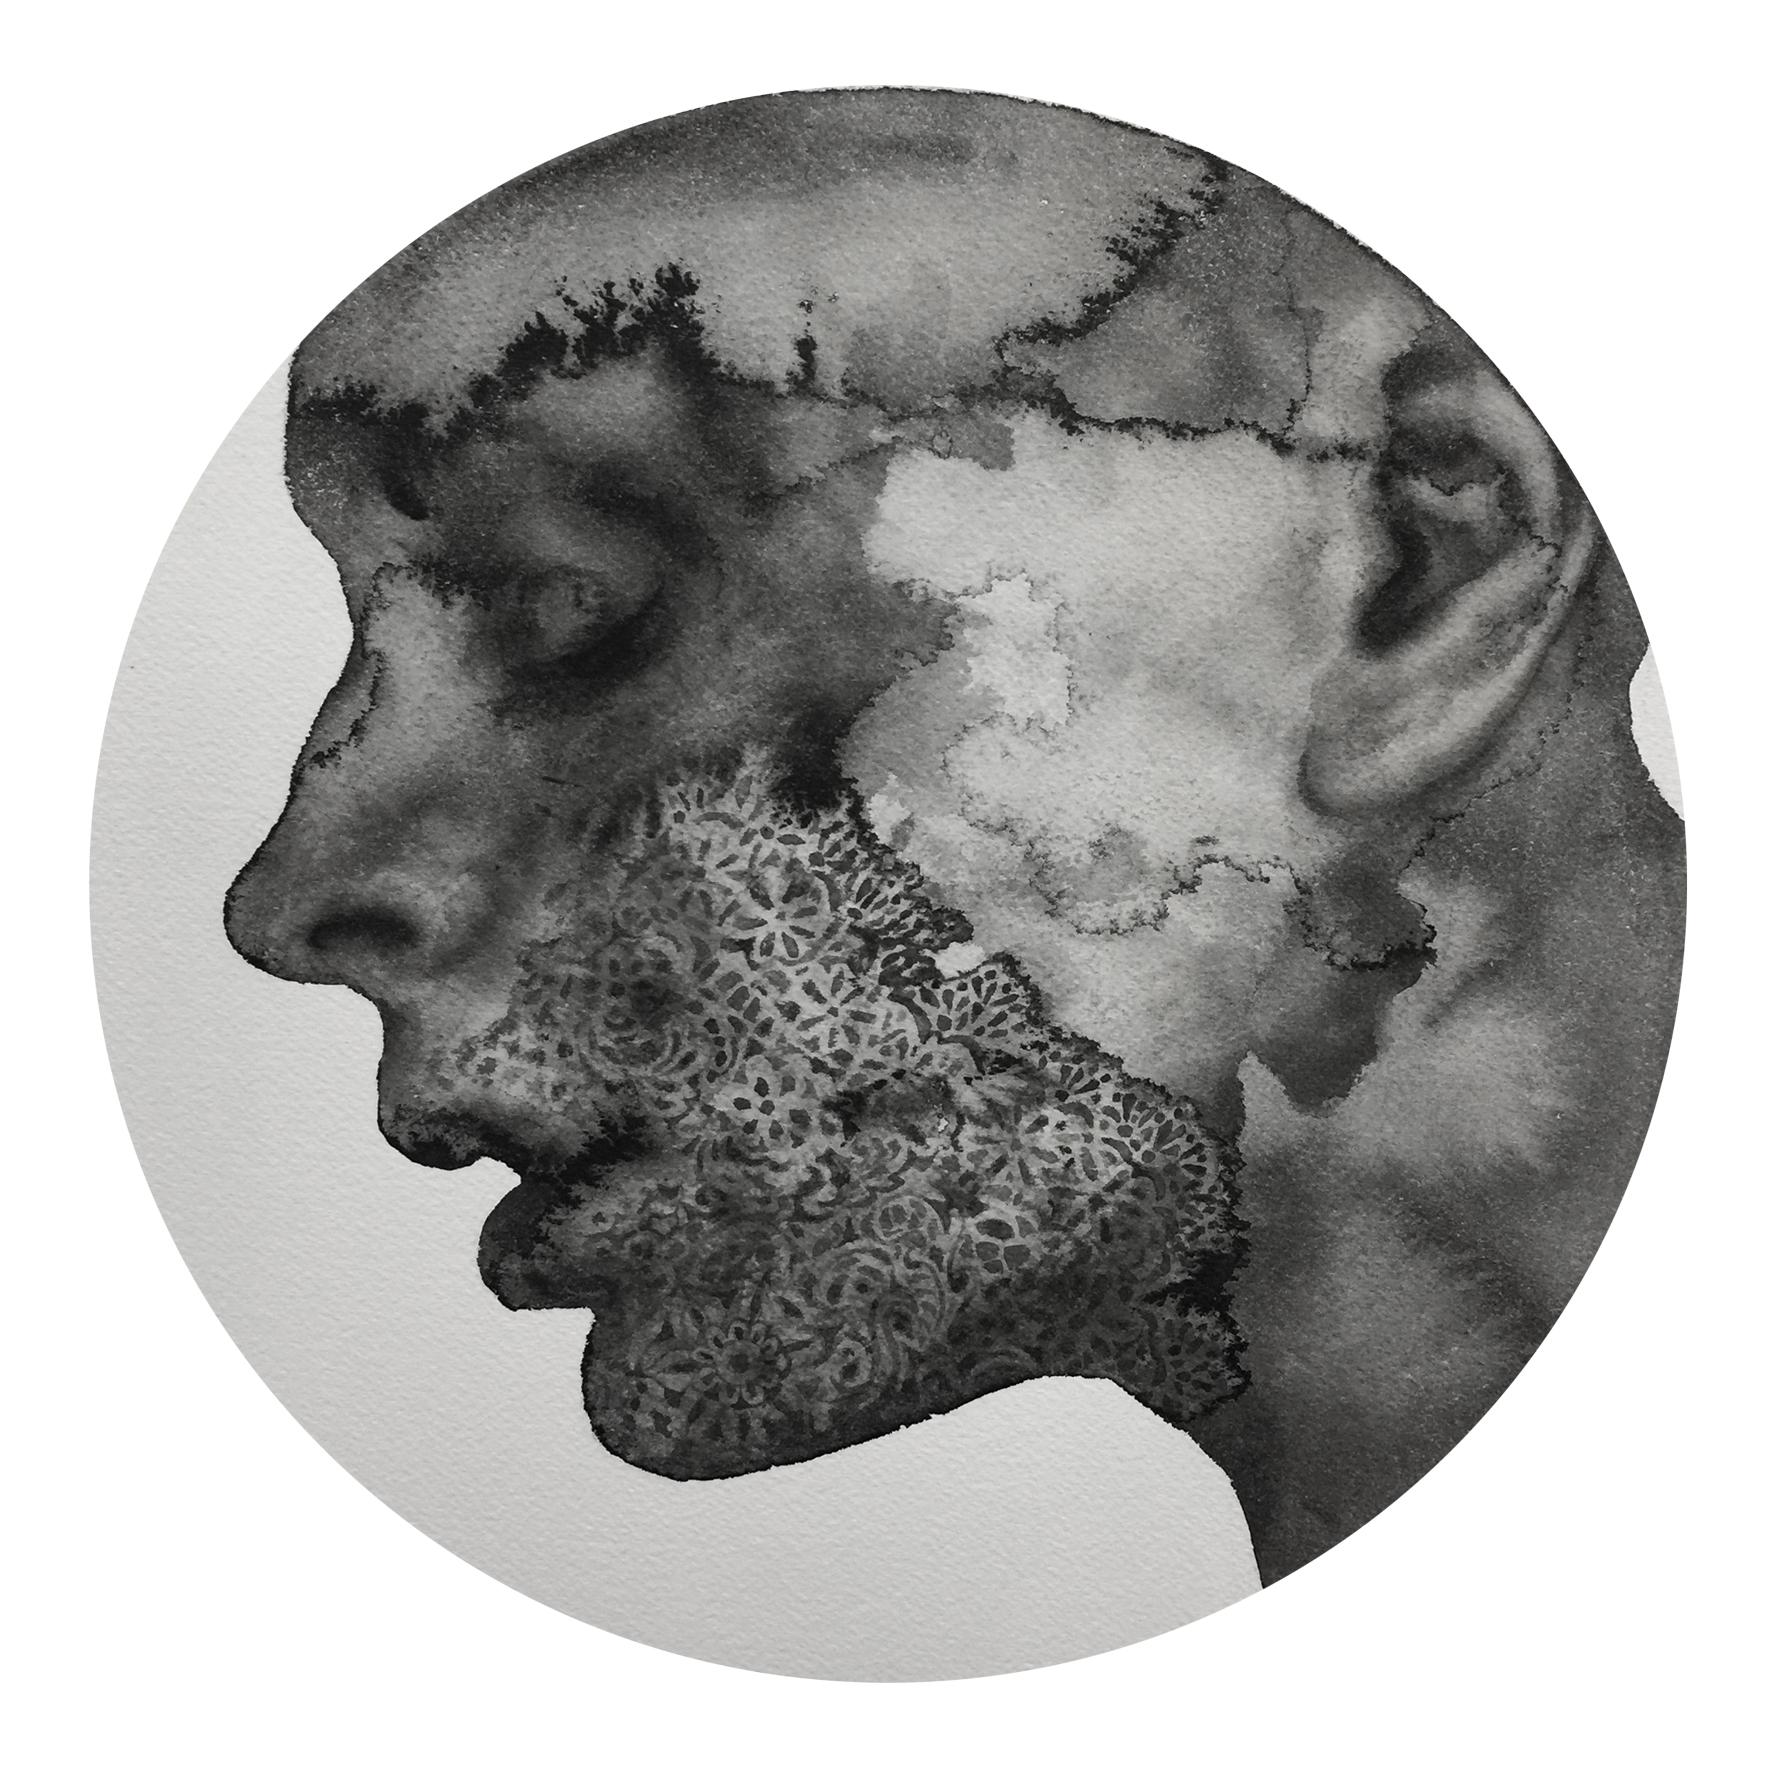 Reflection #6 (Contemporary Chinese Artist Shanlin Ye at Jim Kempner Fine Art)